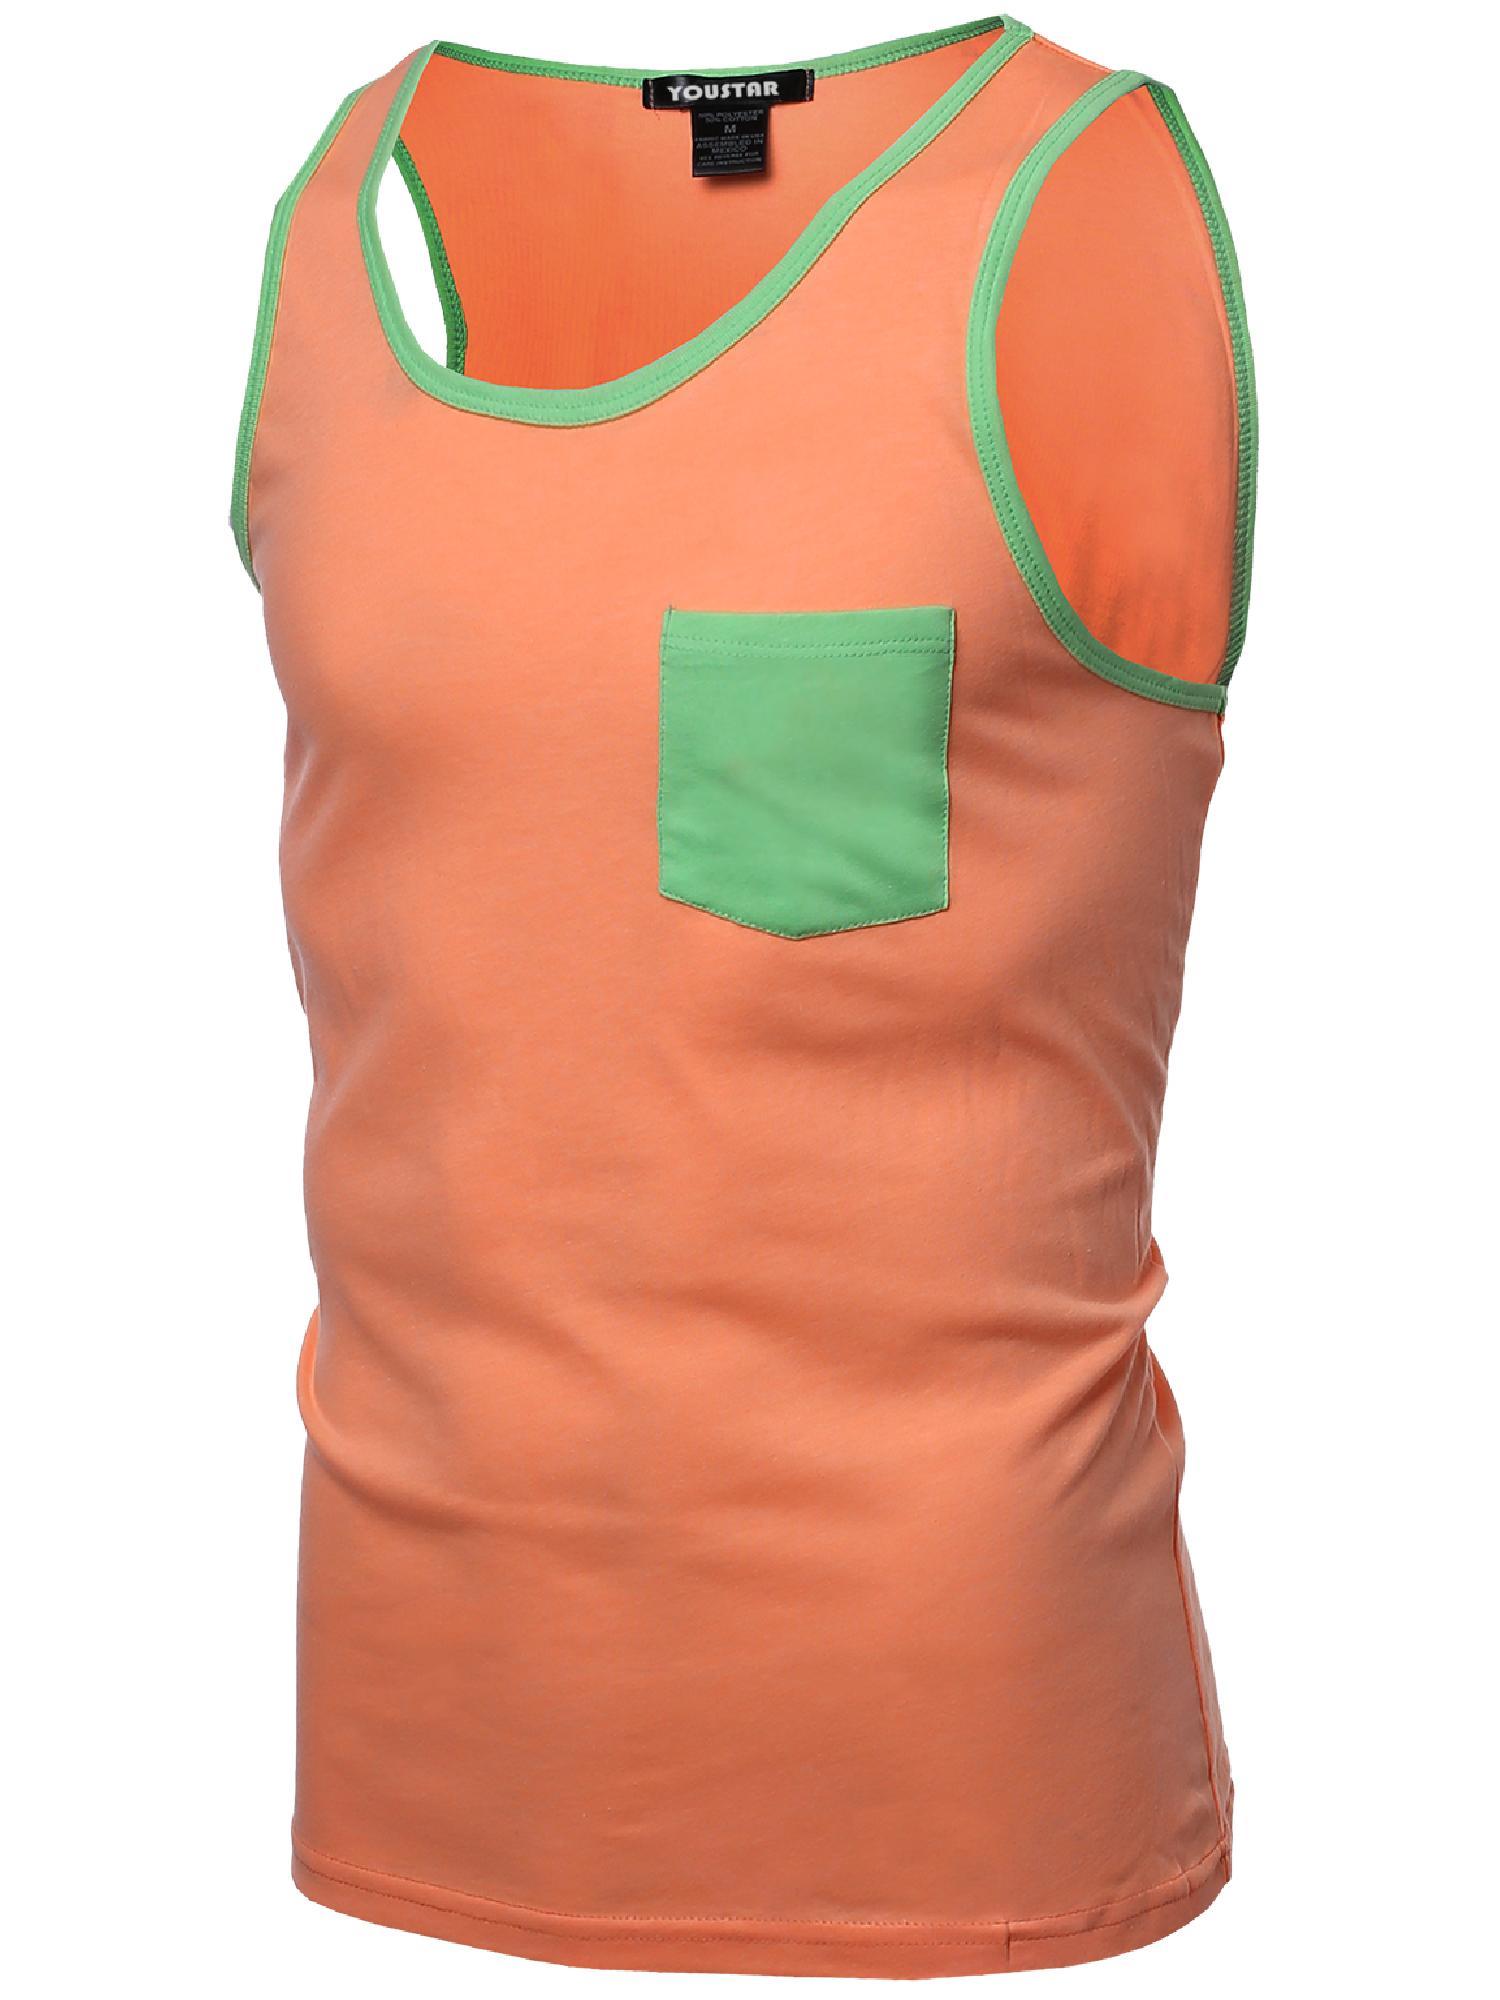 FashionOutfit Men's Neon Color Contrast Pocket Round Neck Tank Tops